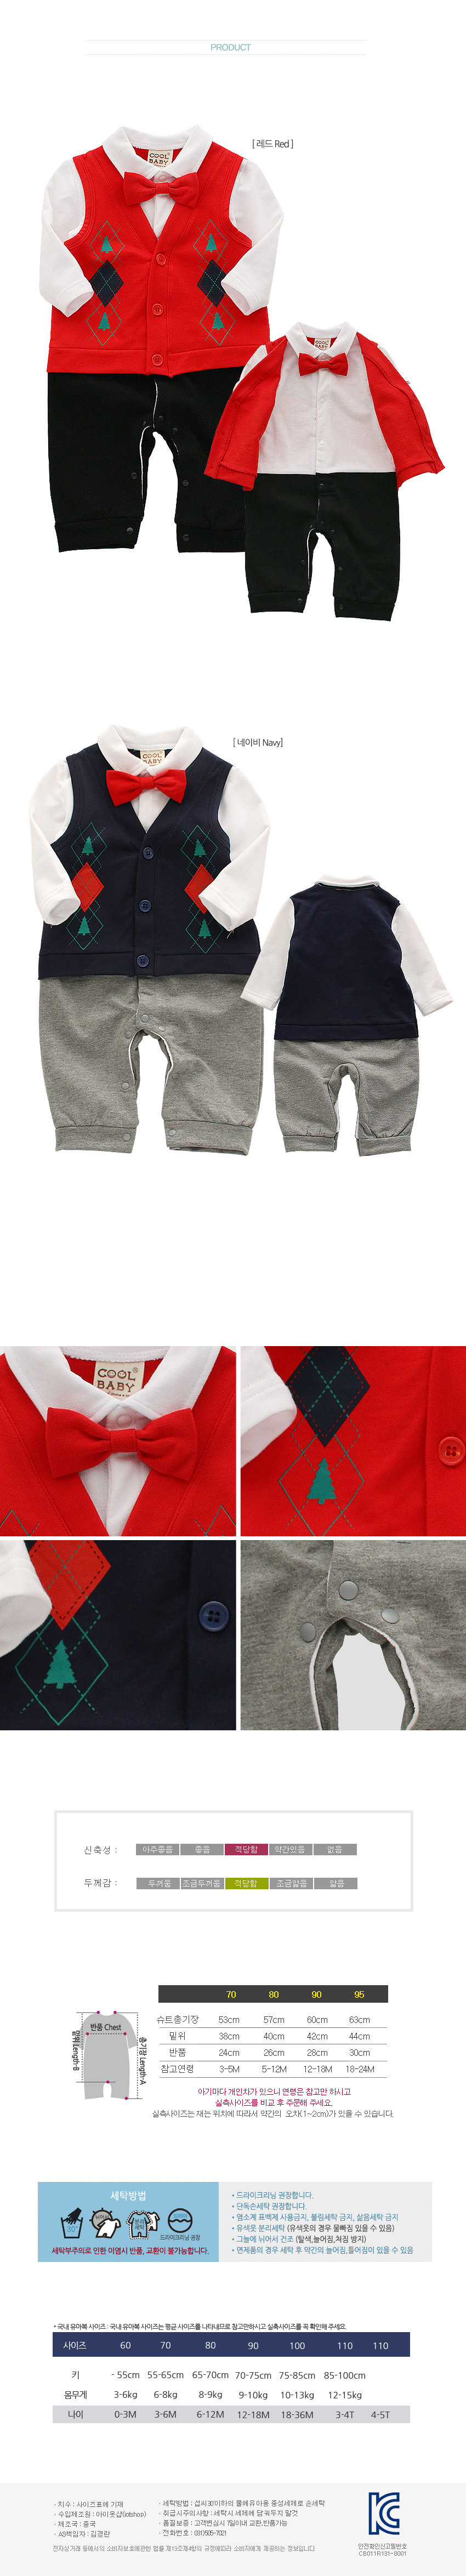 [ BABYMAX ] Toddler Argyle Botai Romper 1306